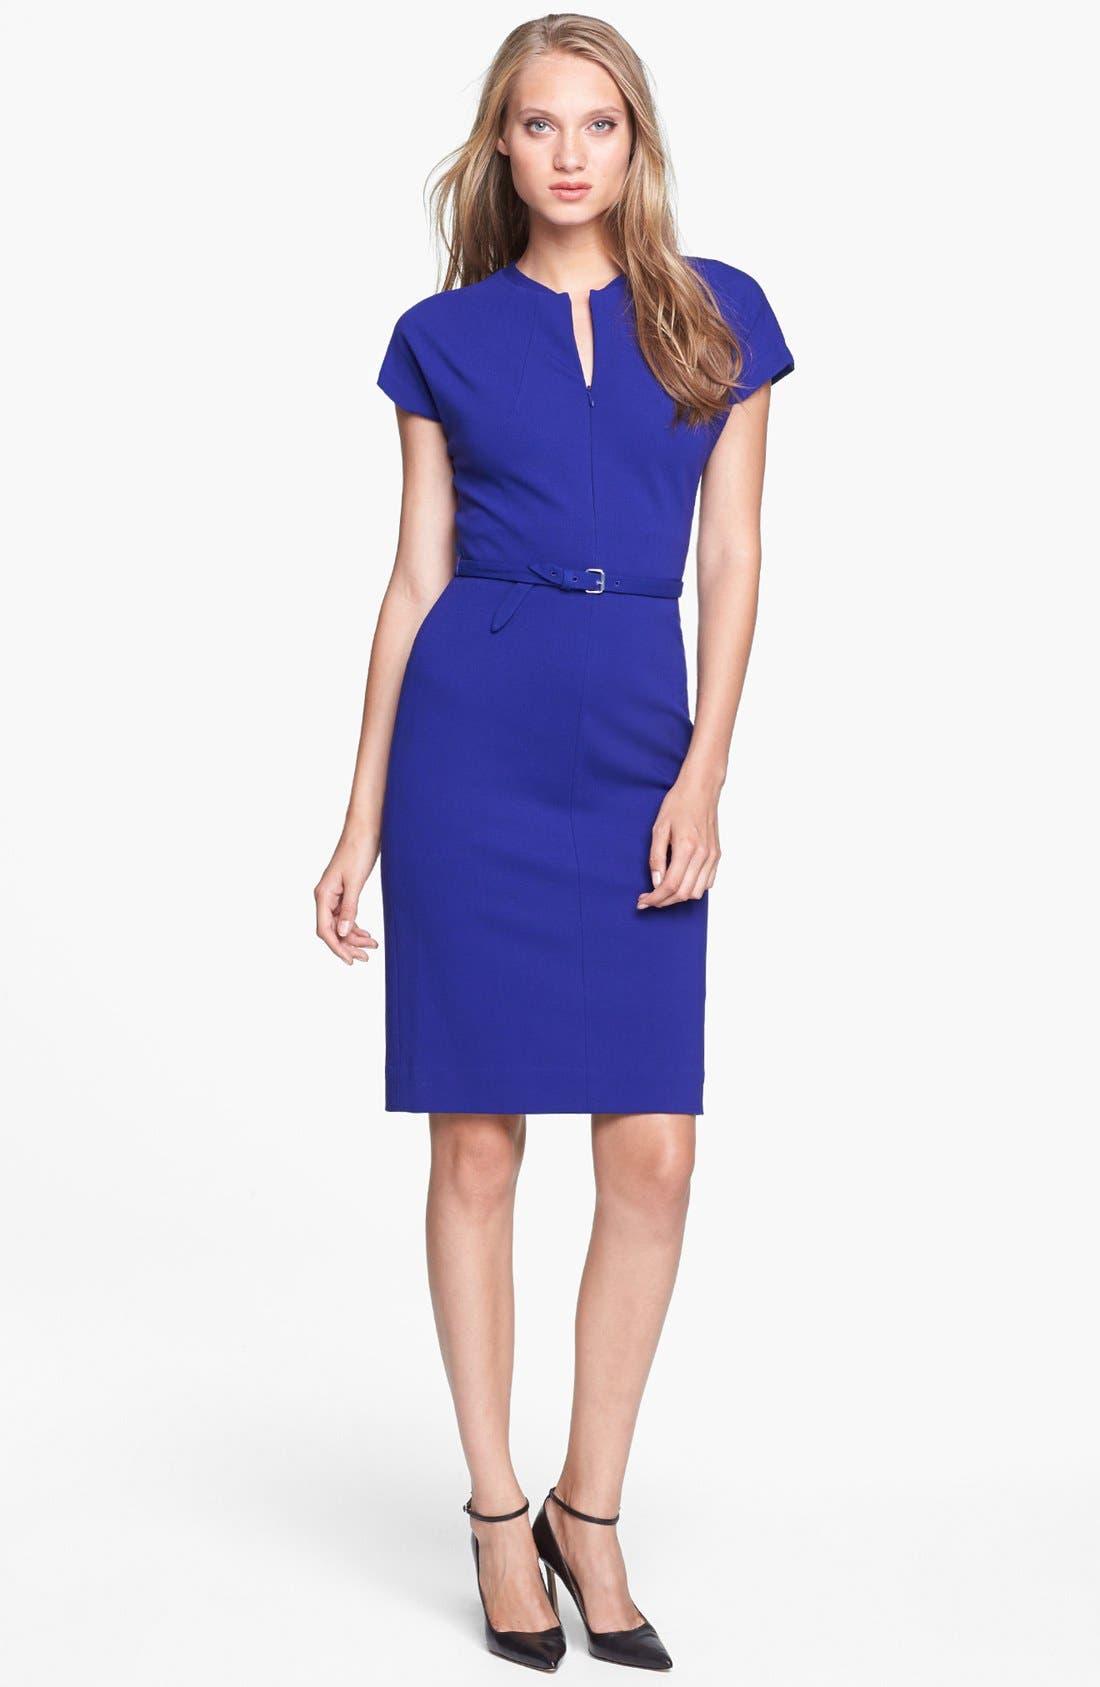 Alternate Image 1 Selected - Diane von Furstenberg 'Maizah' Twill Sheath Dress